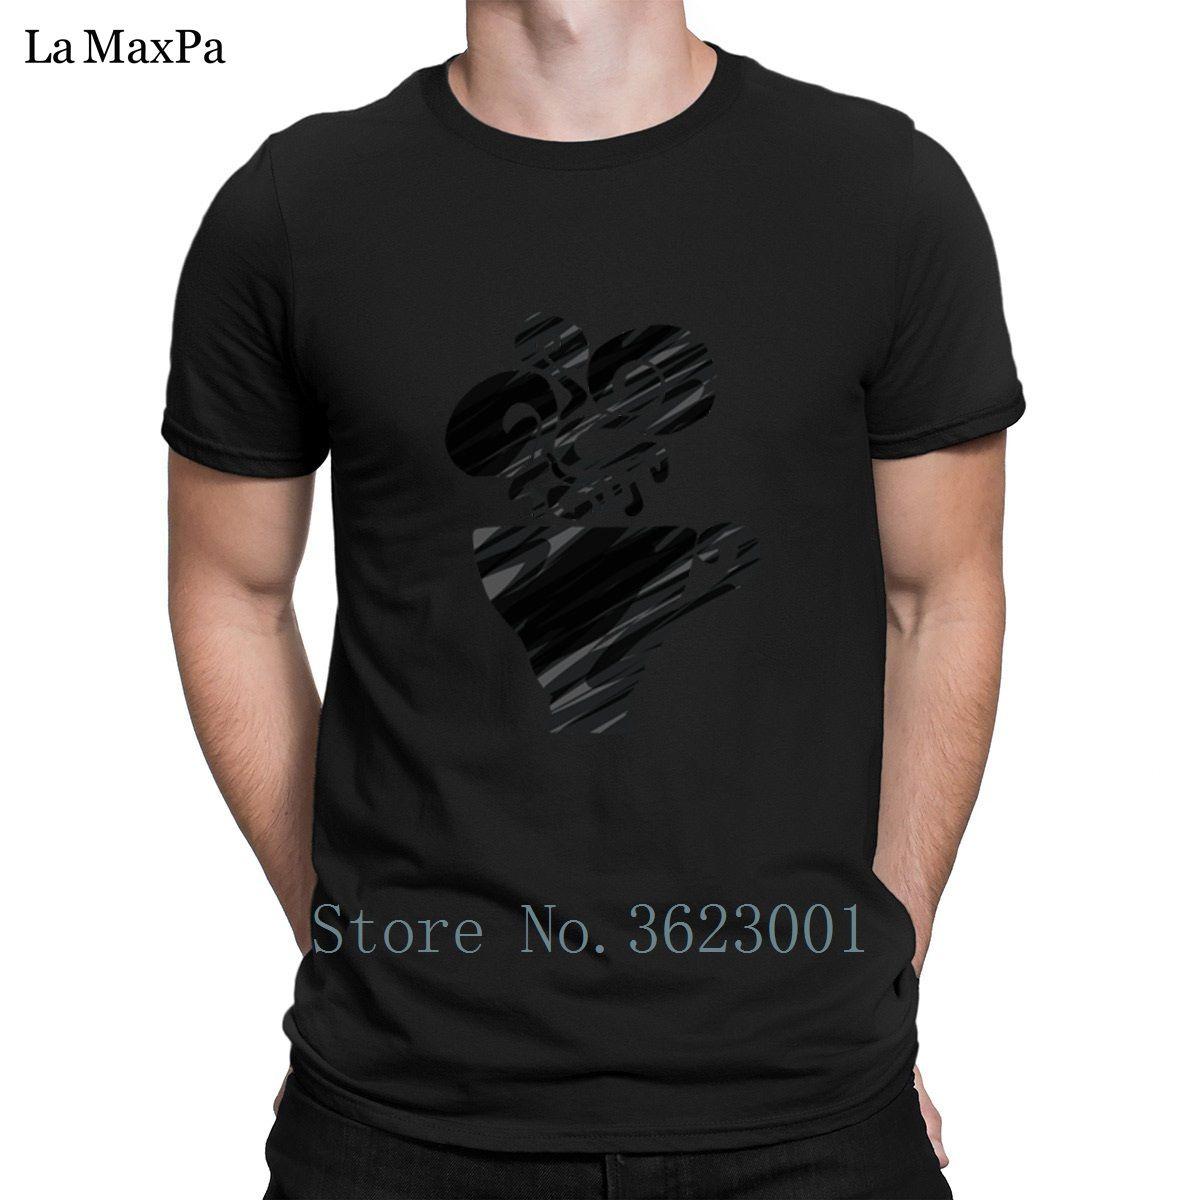 Create Classic Men's Tshirt Black Tea Tee Shirt For Men Spring T-Shirt Mens Funky T Shirt Euro Size S-3xl Hot Sale